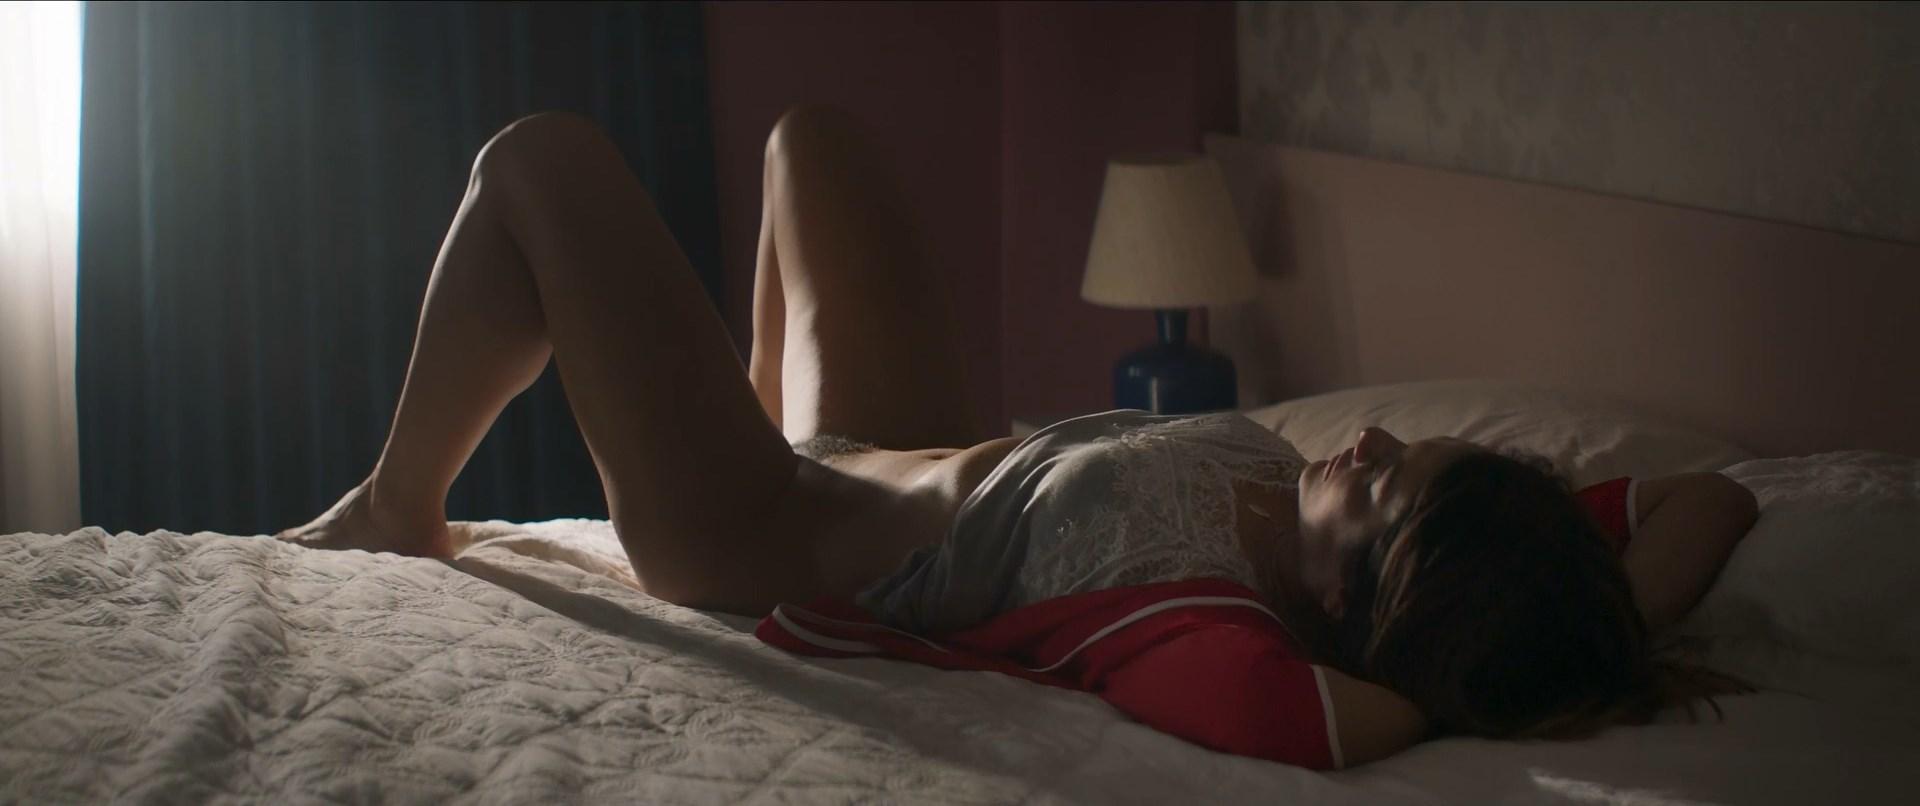 Andreia Horta Fotos Nua watch online - dira paes, etc - divino amor (2019) hd 1080p.